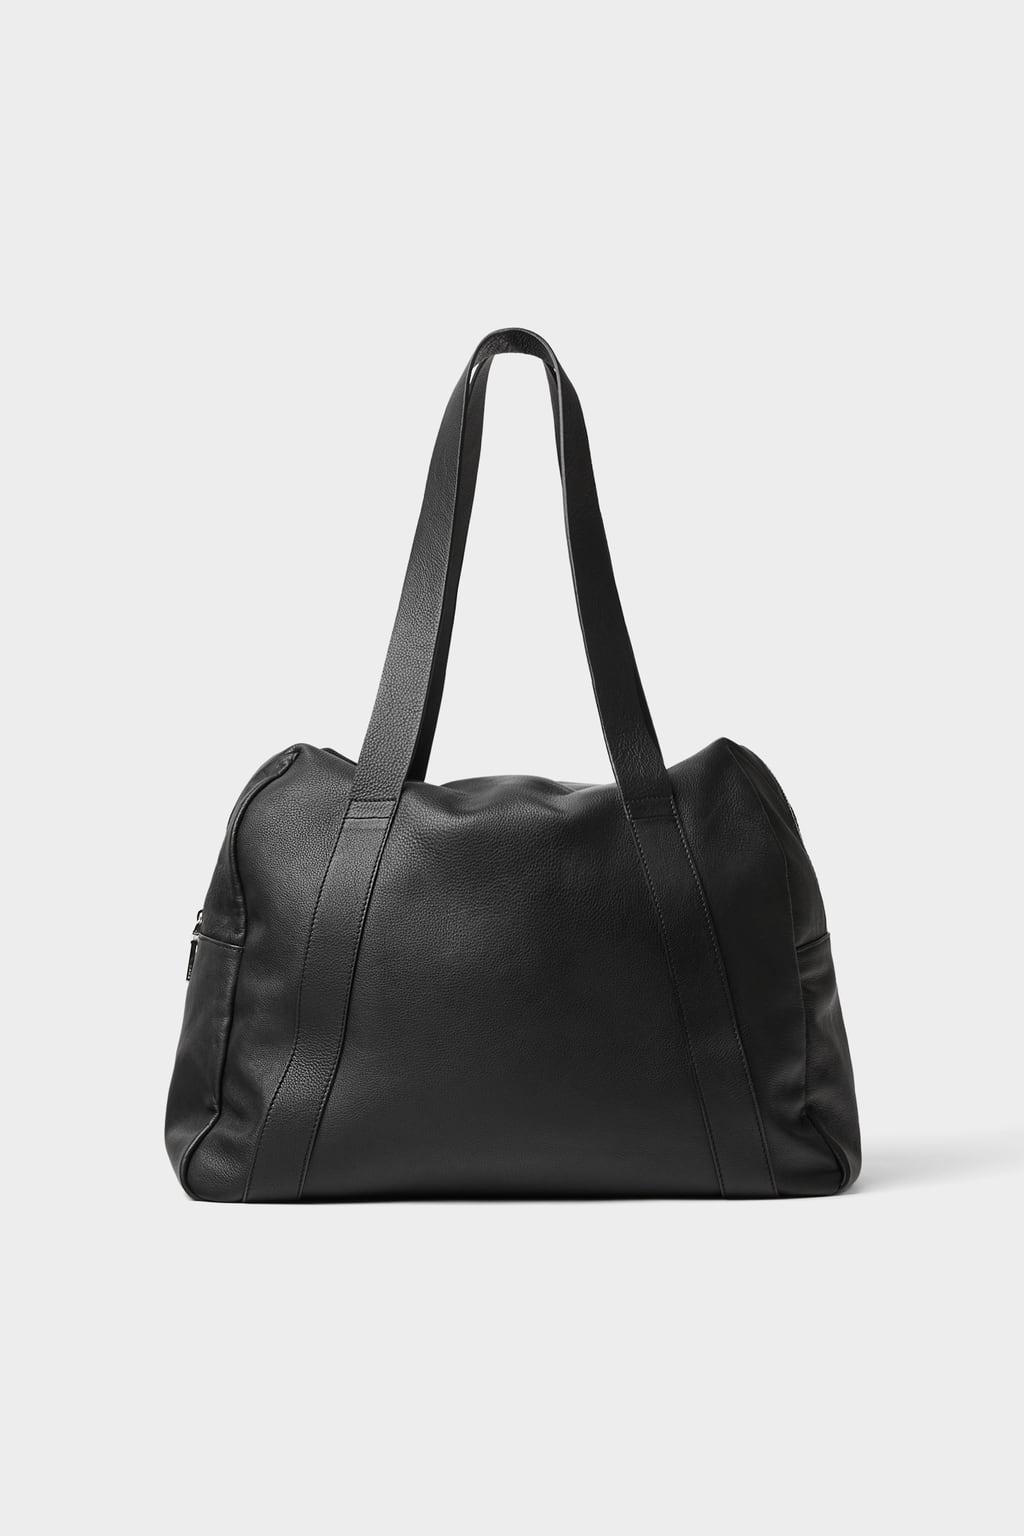 Black Leather Shopper Handbag by Zara